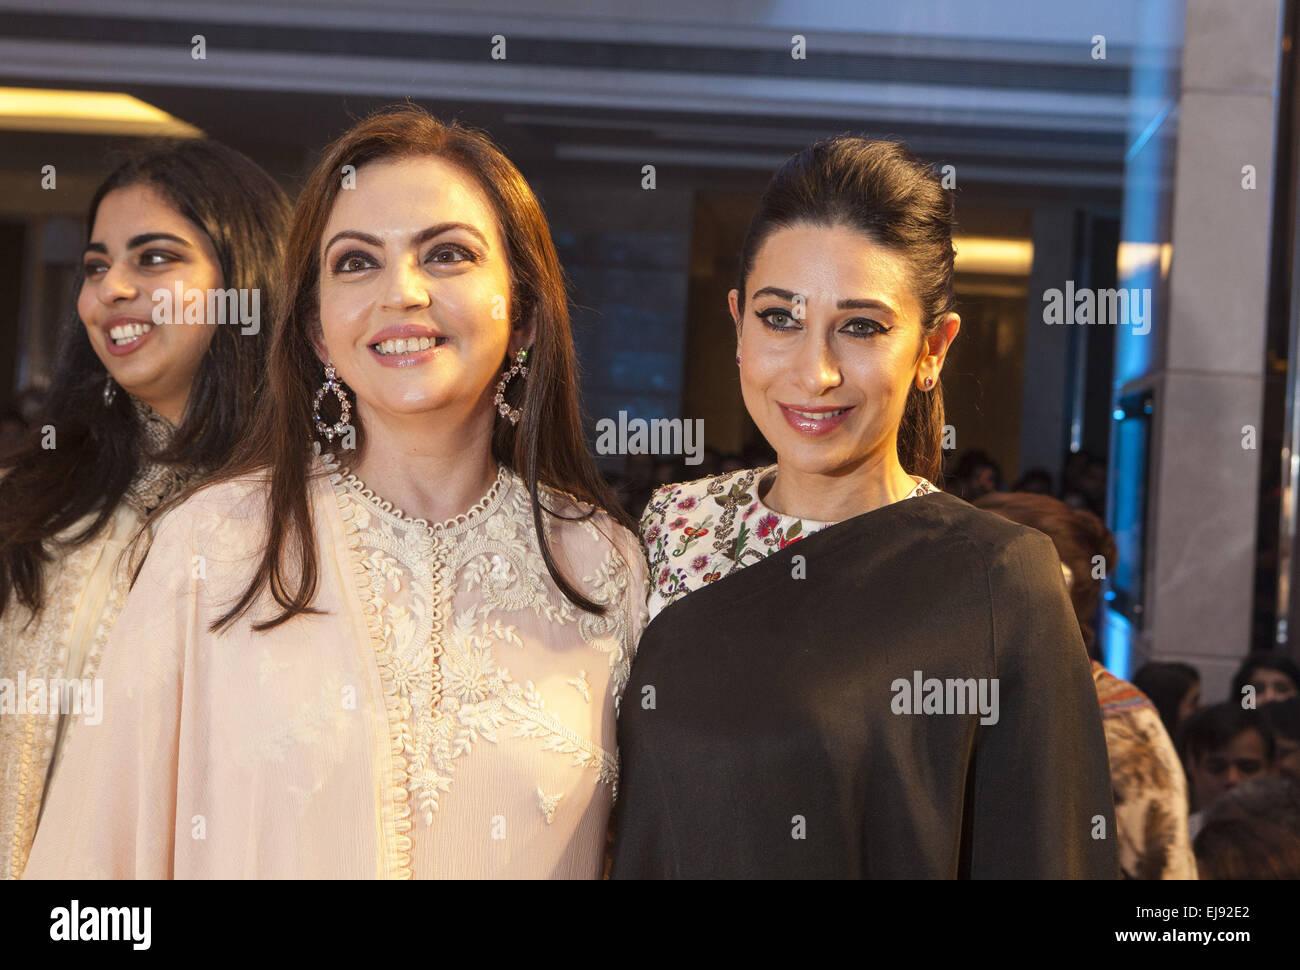 Mumbai, Maharashtra, India. 22nd Mar, 2015. 22 March 2015 : Mumbai - INDIA.Nita Ambani (L) & Actress Karishma - Stock Image